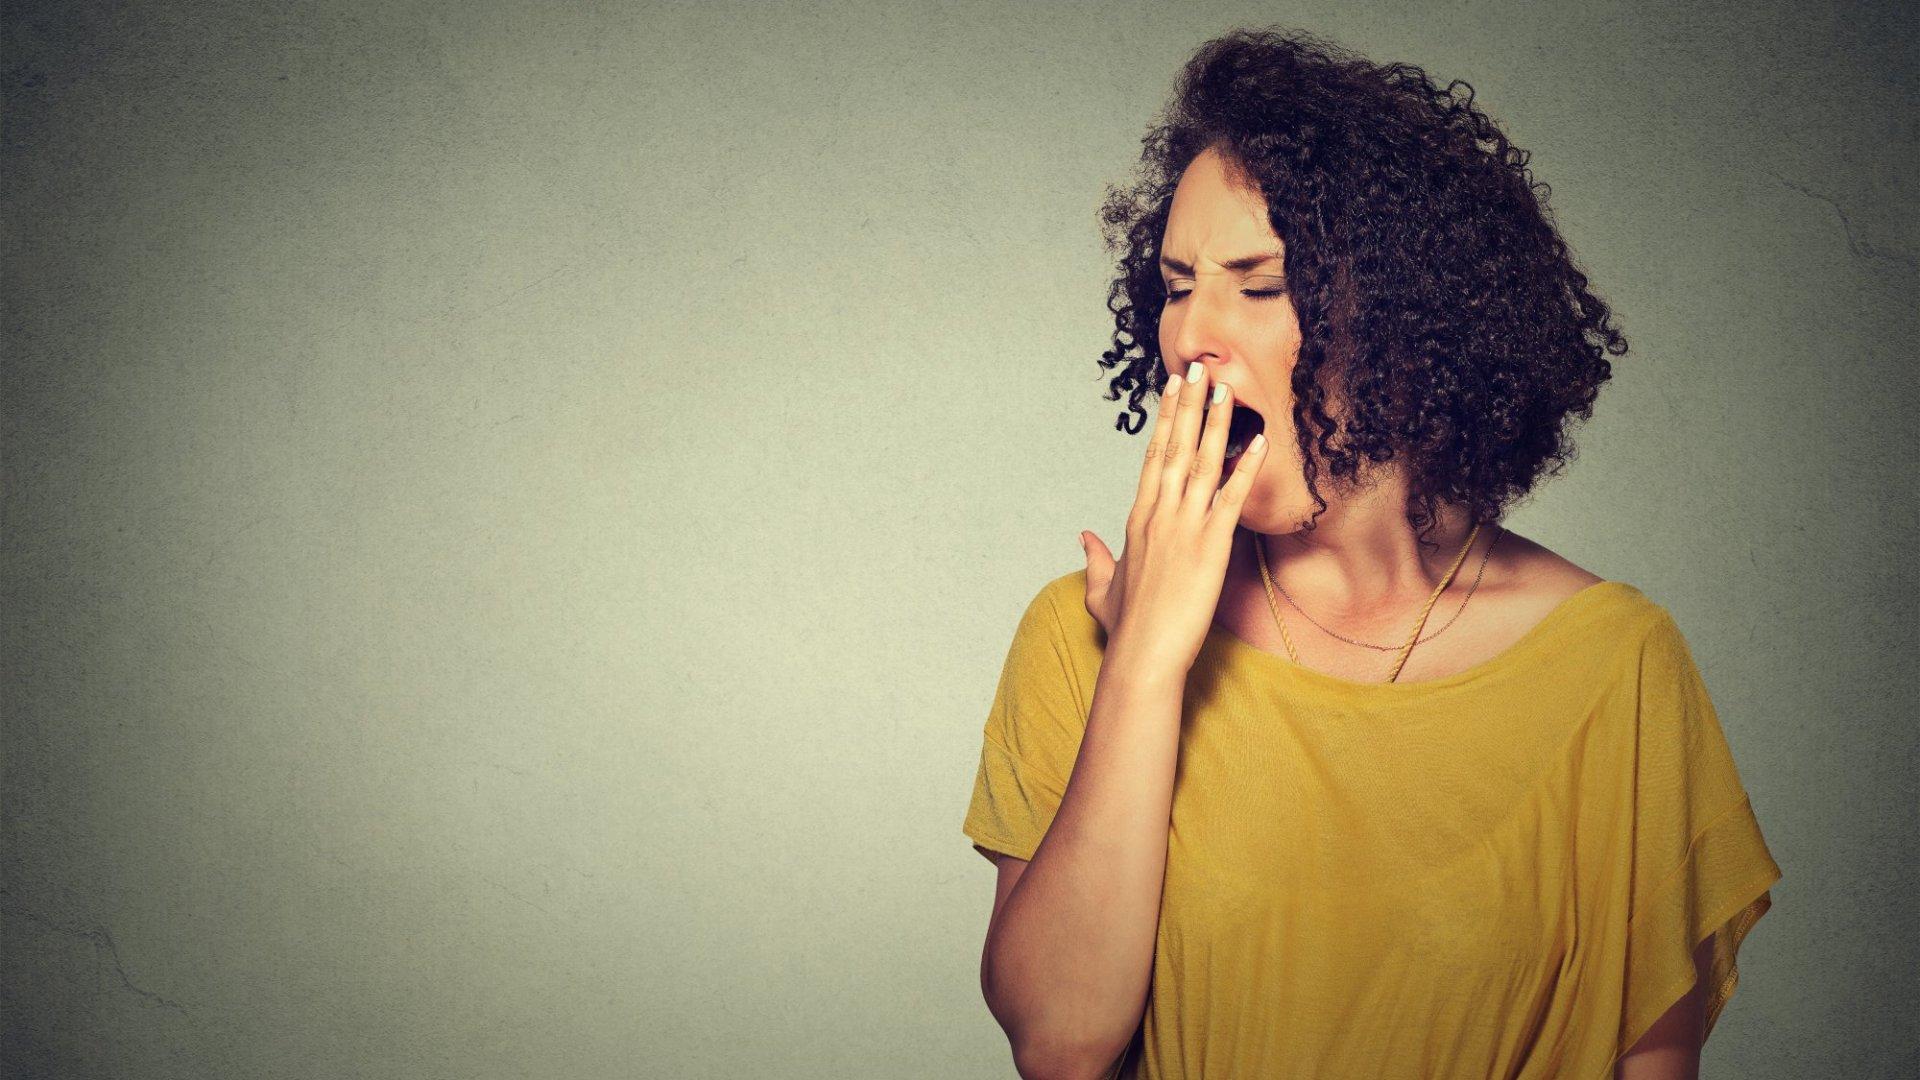 3 Bad Excuses People Use to Justify Their Lack of Sleep